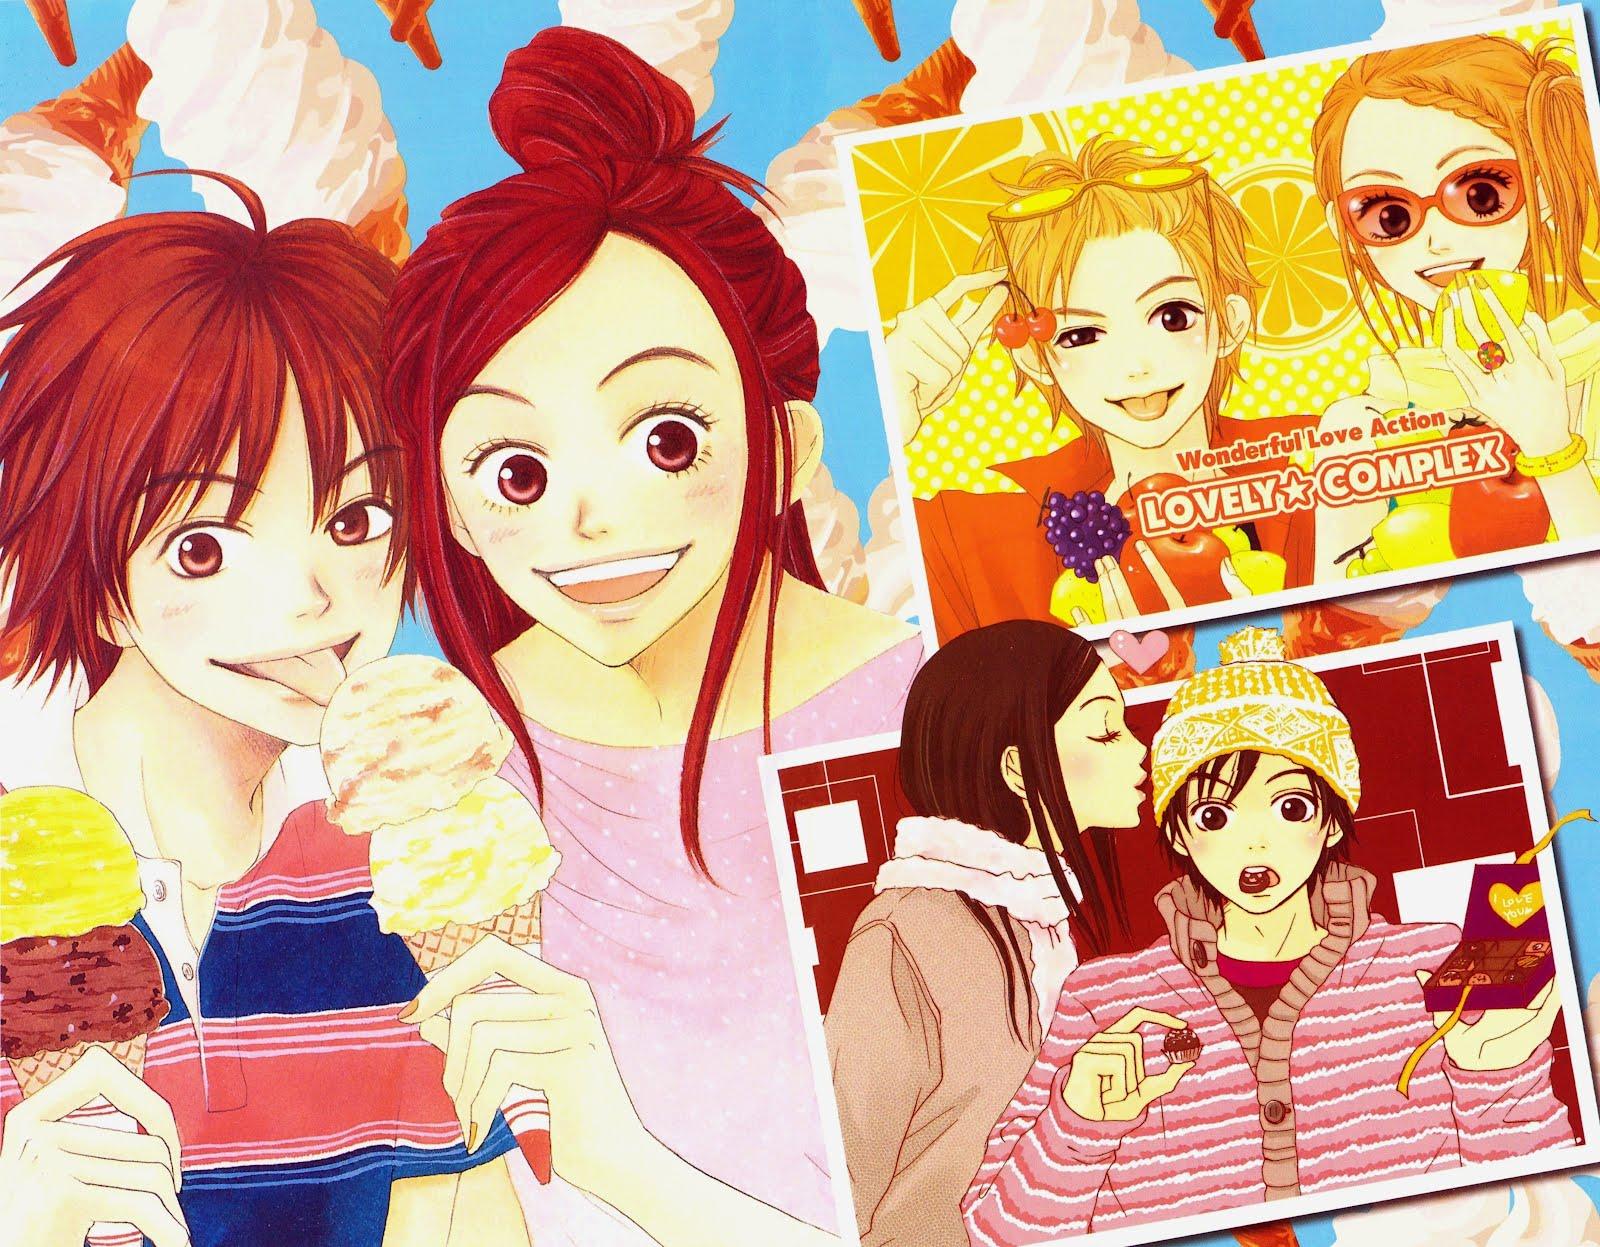 Lovely Complex Kiss Manga